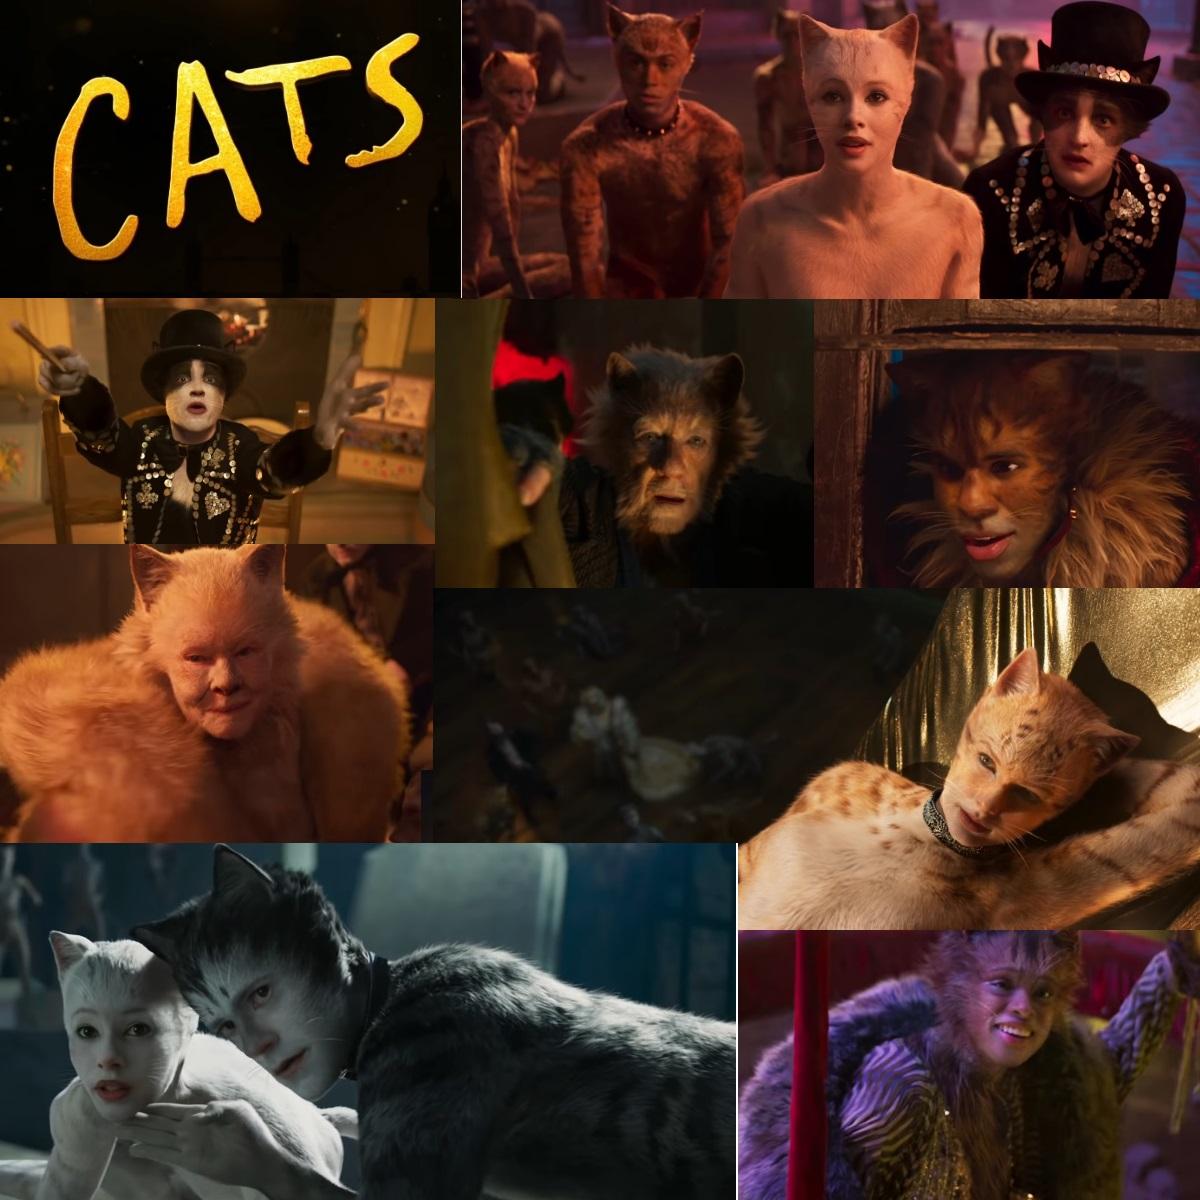 Cats - Film 2019